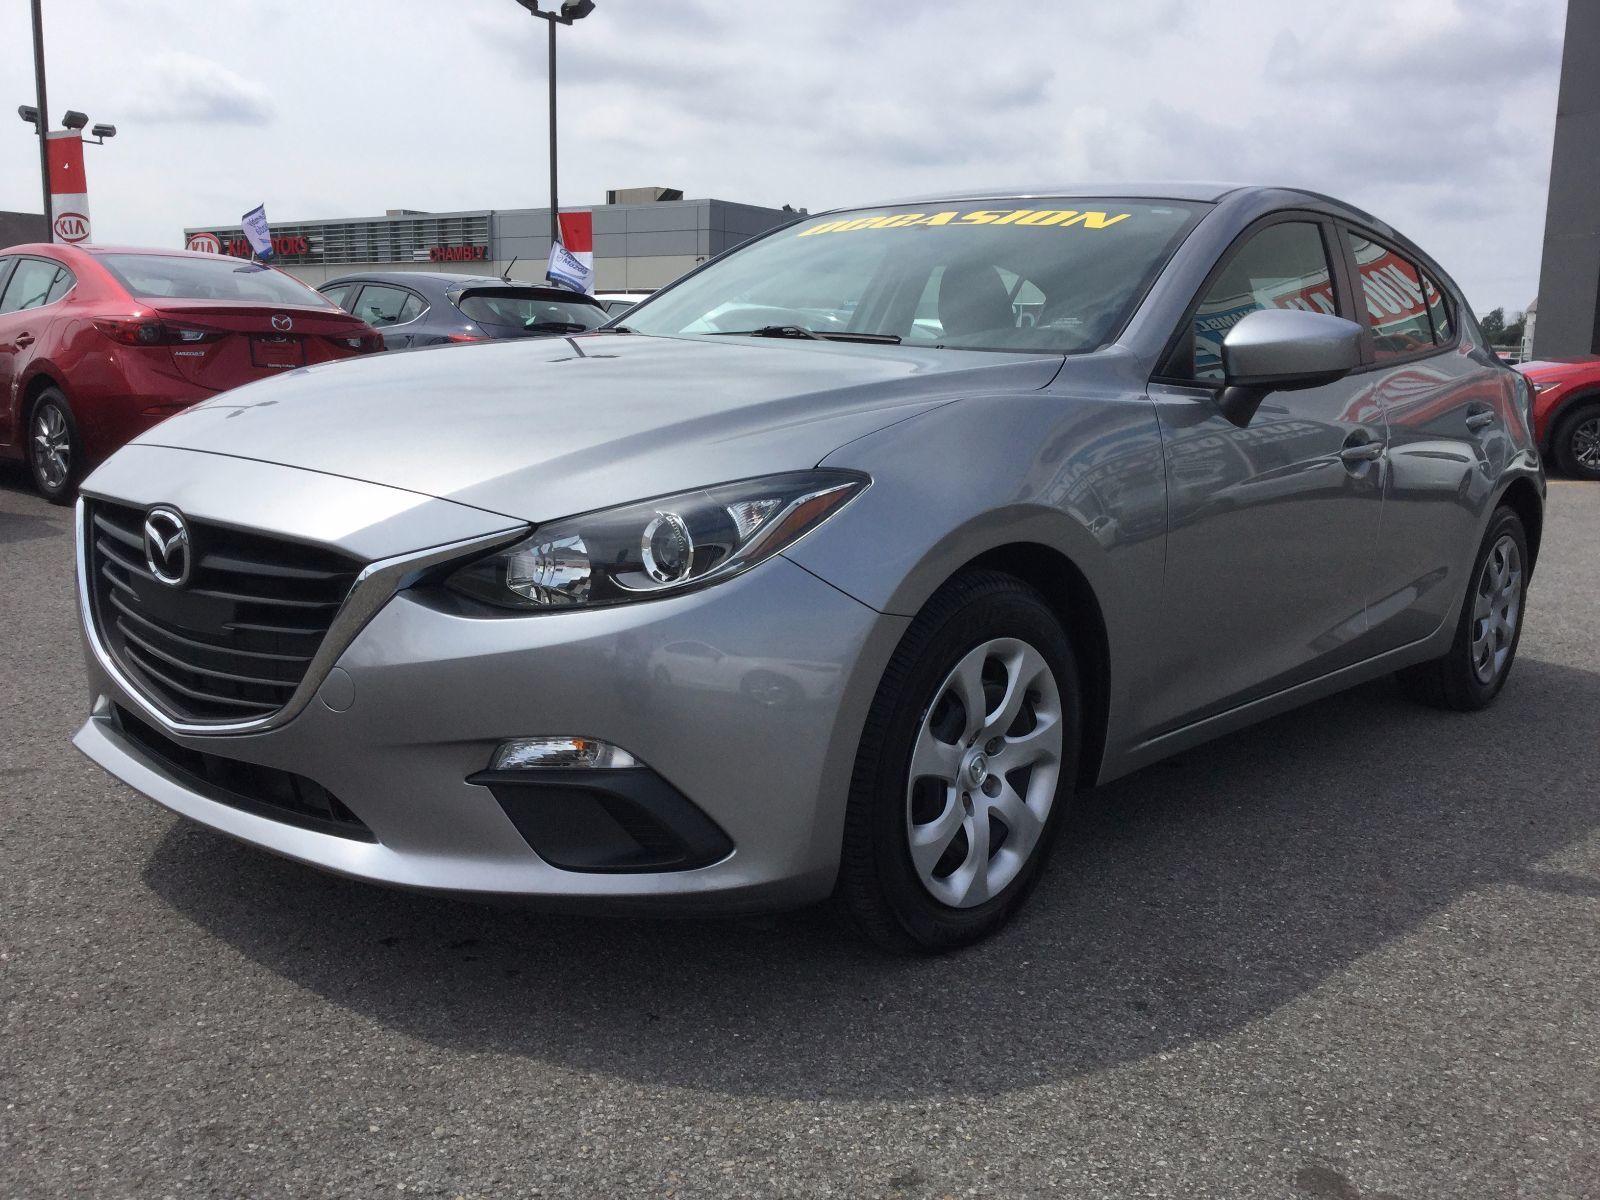 Mazda Mazda3 **RÉSERVÉ**, GX-SKY, SEULEMENT 33000 KM, BLUETOOTH 2014 JAMAIS ACCIDENTÉ, UN SEUL PROPRIÉTAIRE